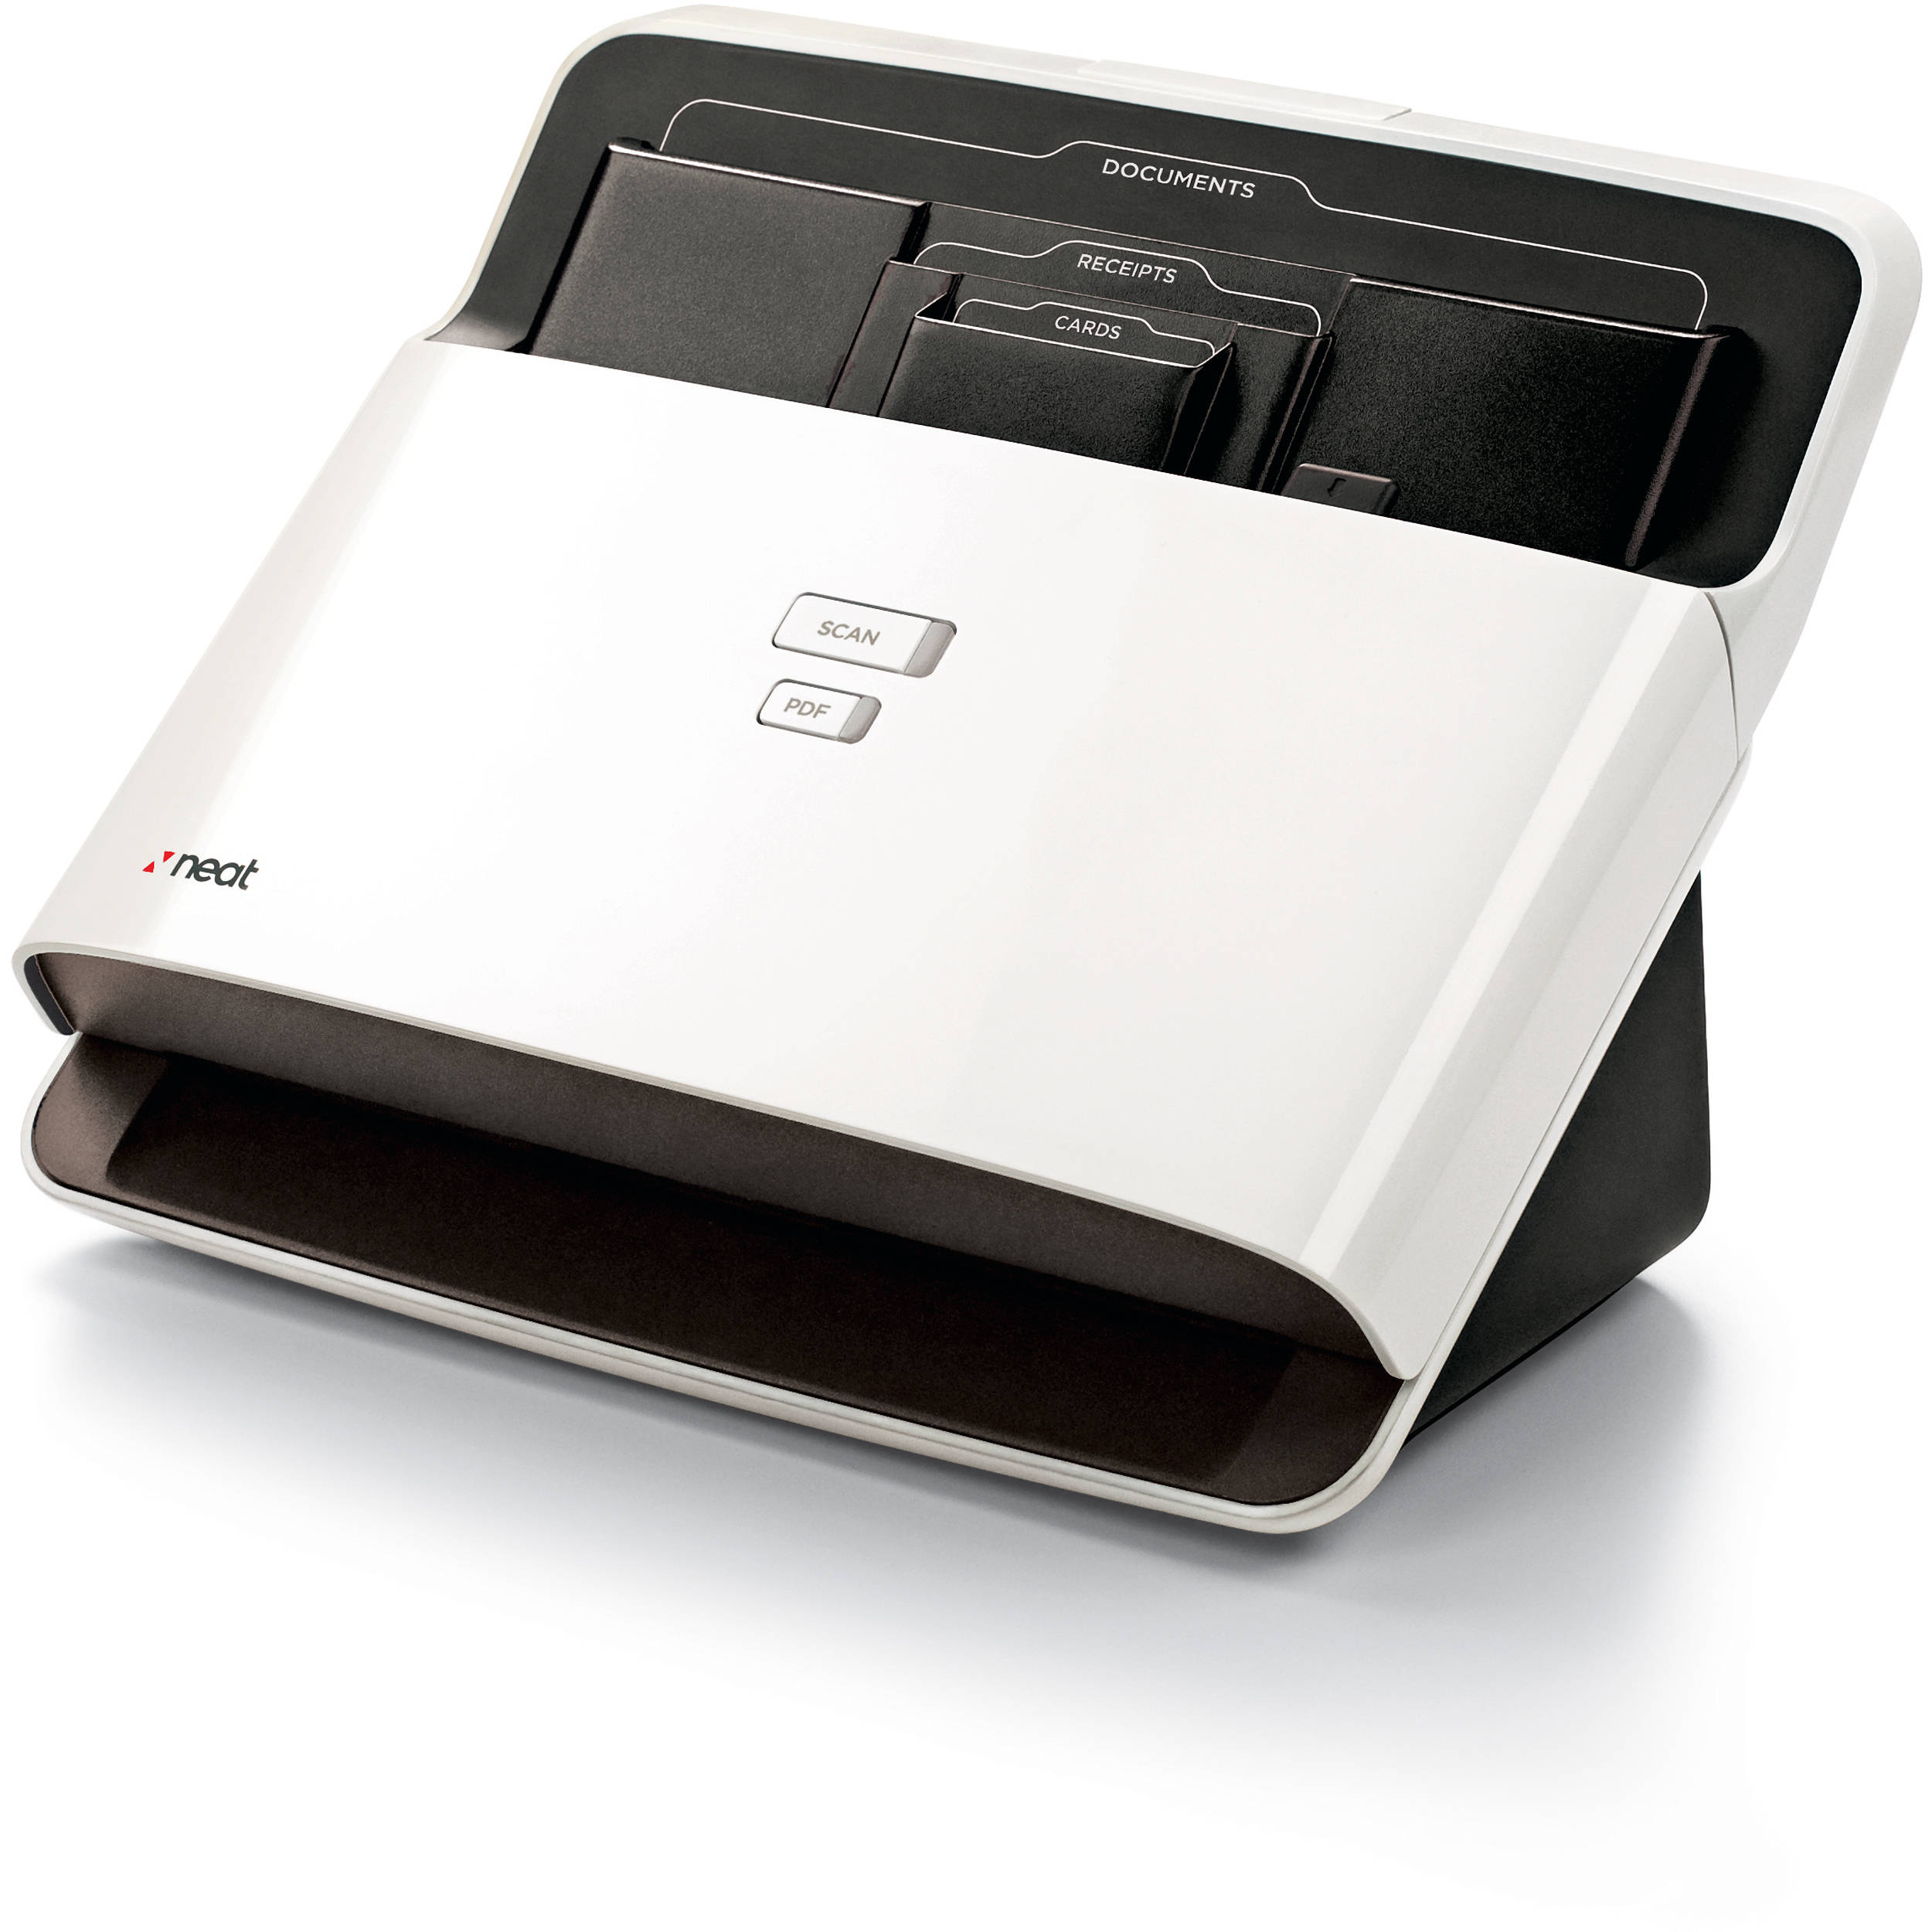 neatreceipts neatdesk document scanner with neat smart 2005144 With neat document scanner reviews